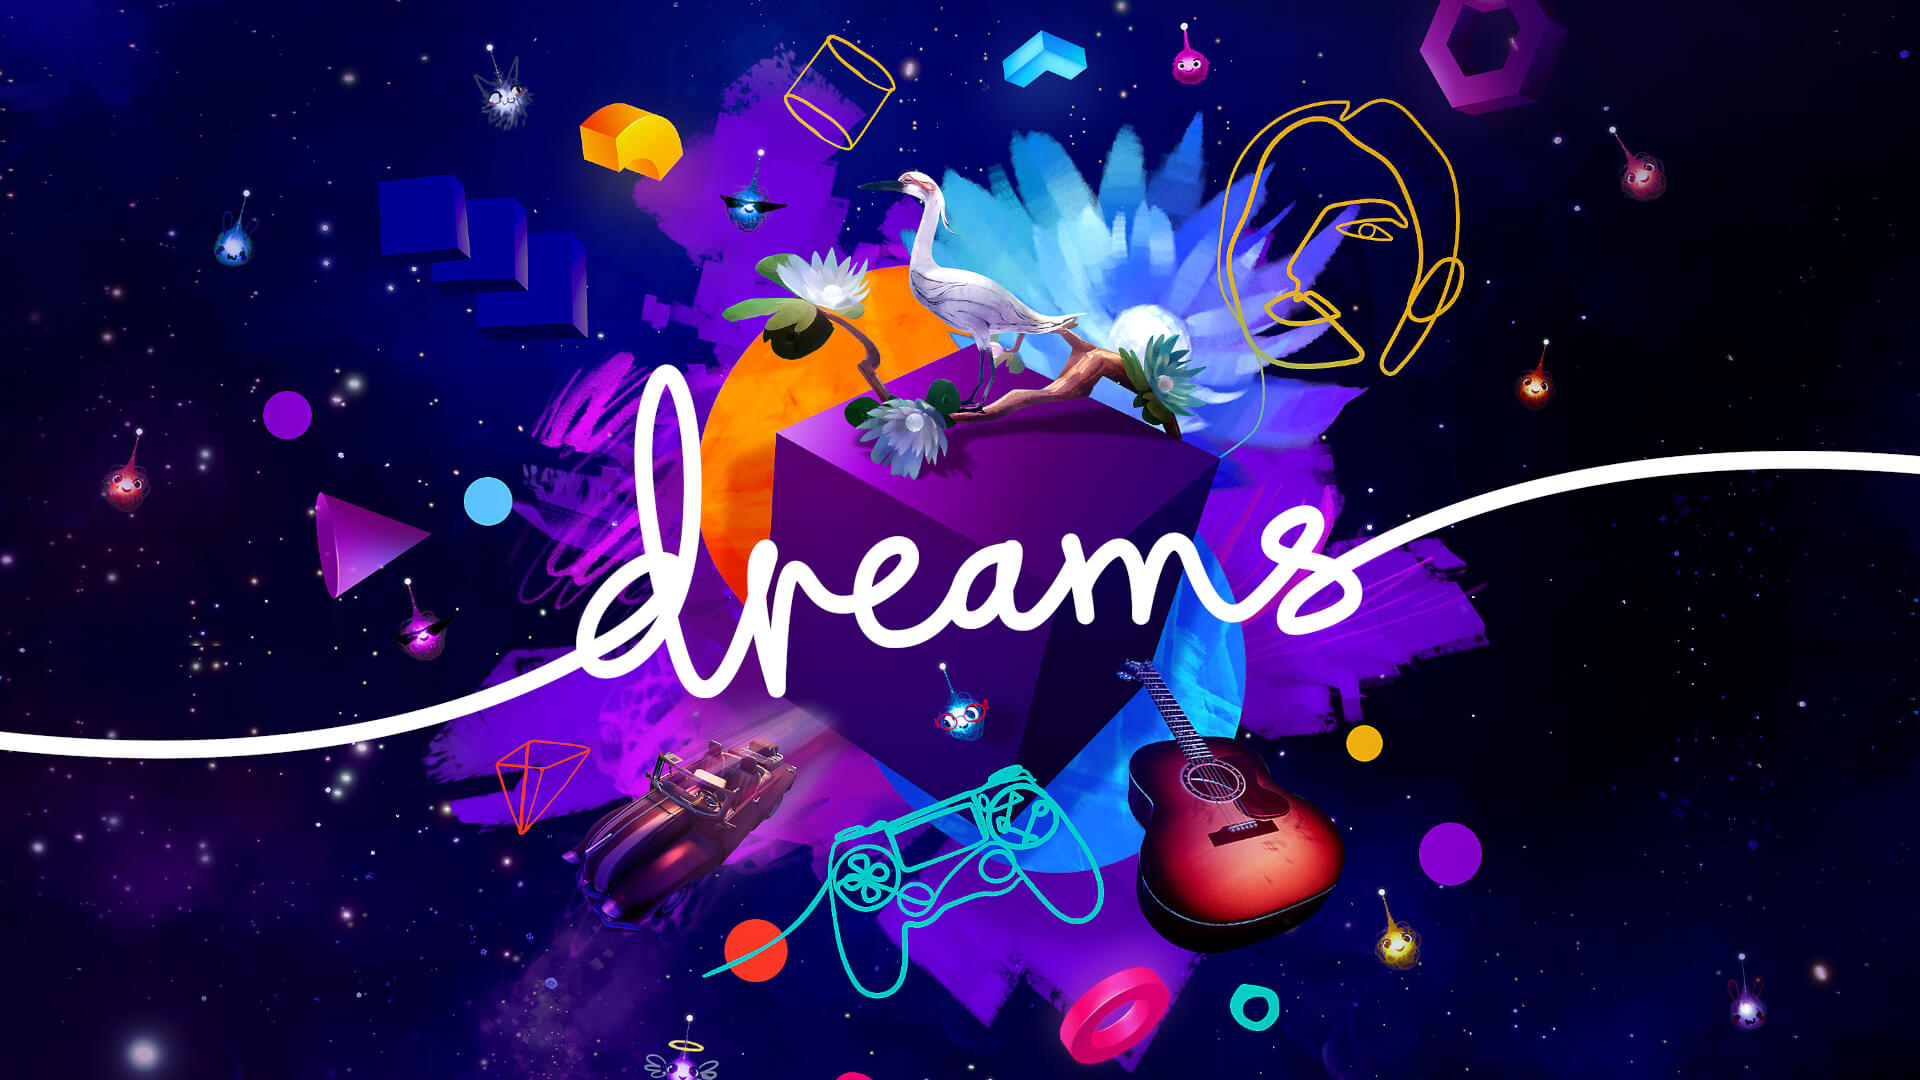 Dreams: The Creativity Game